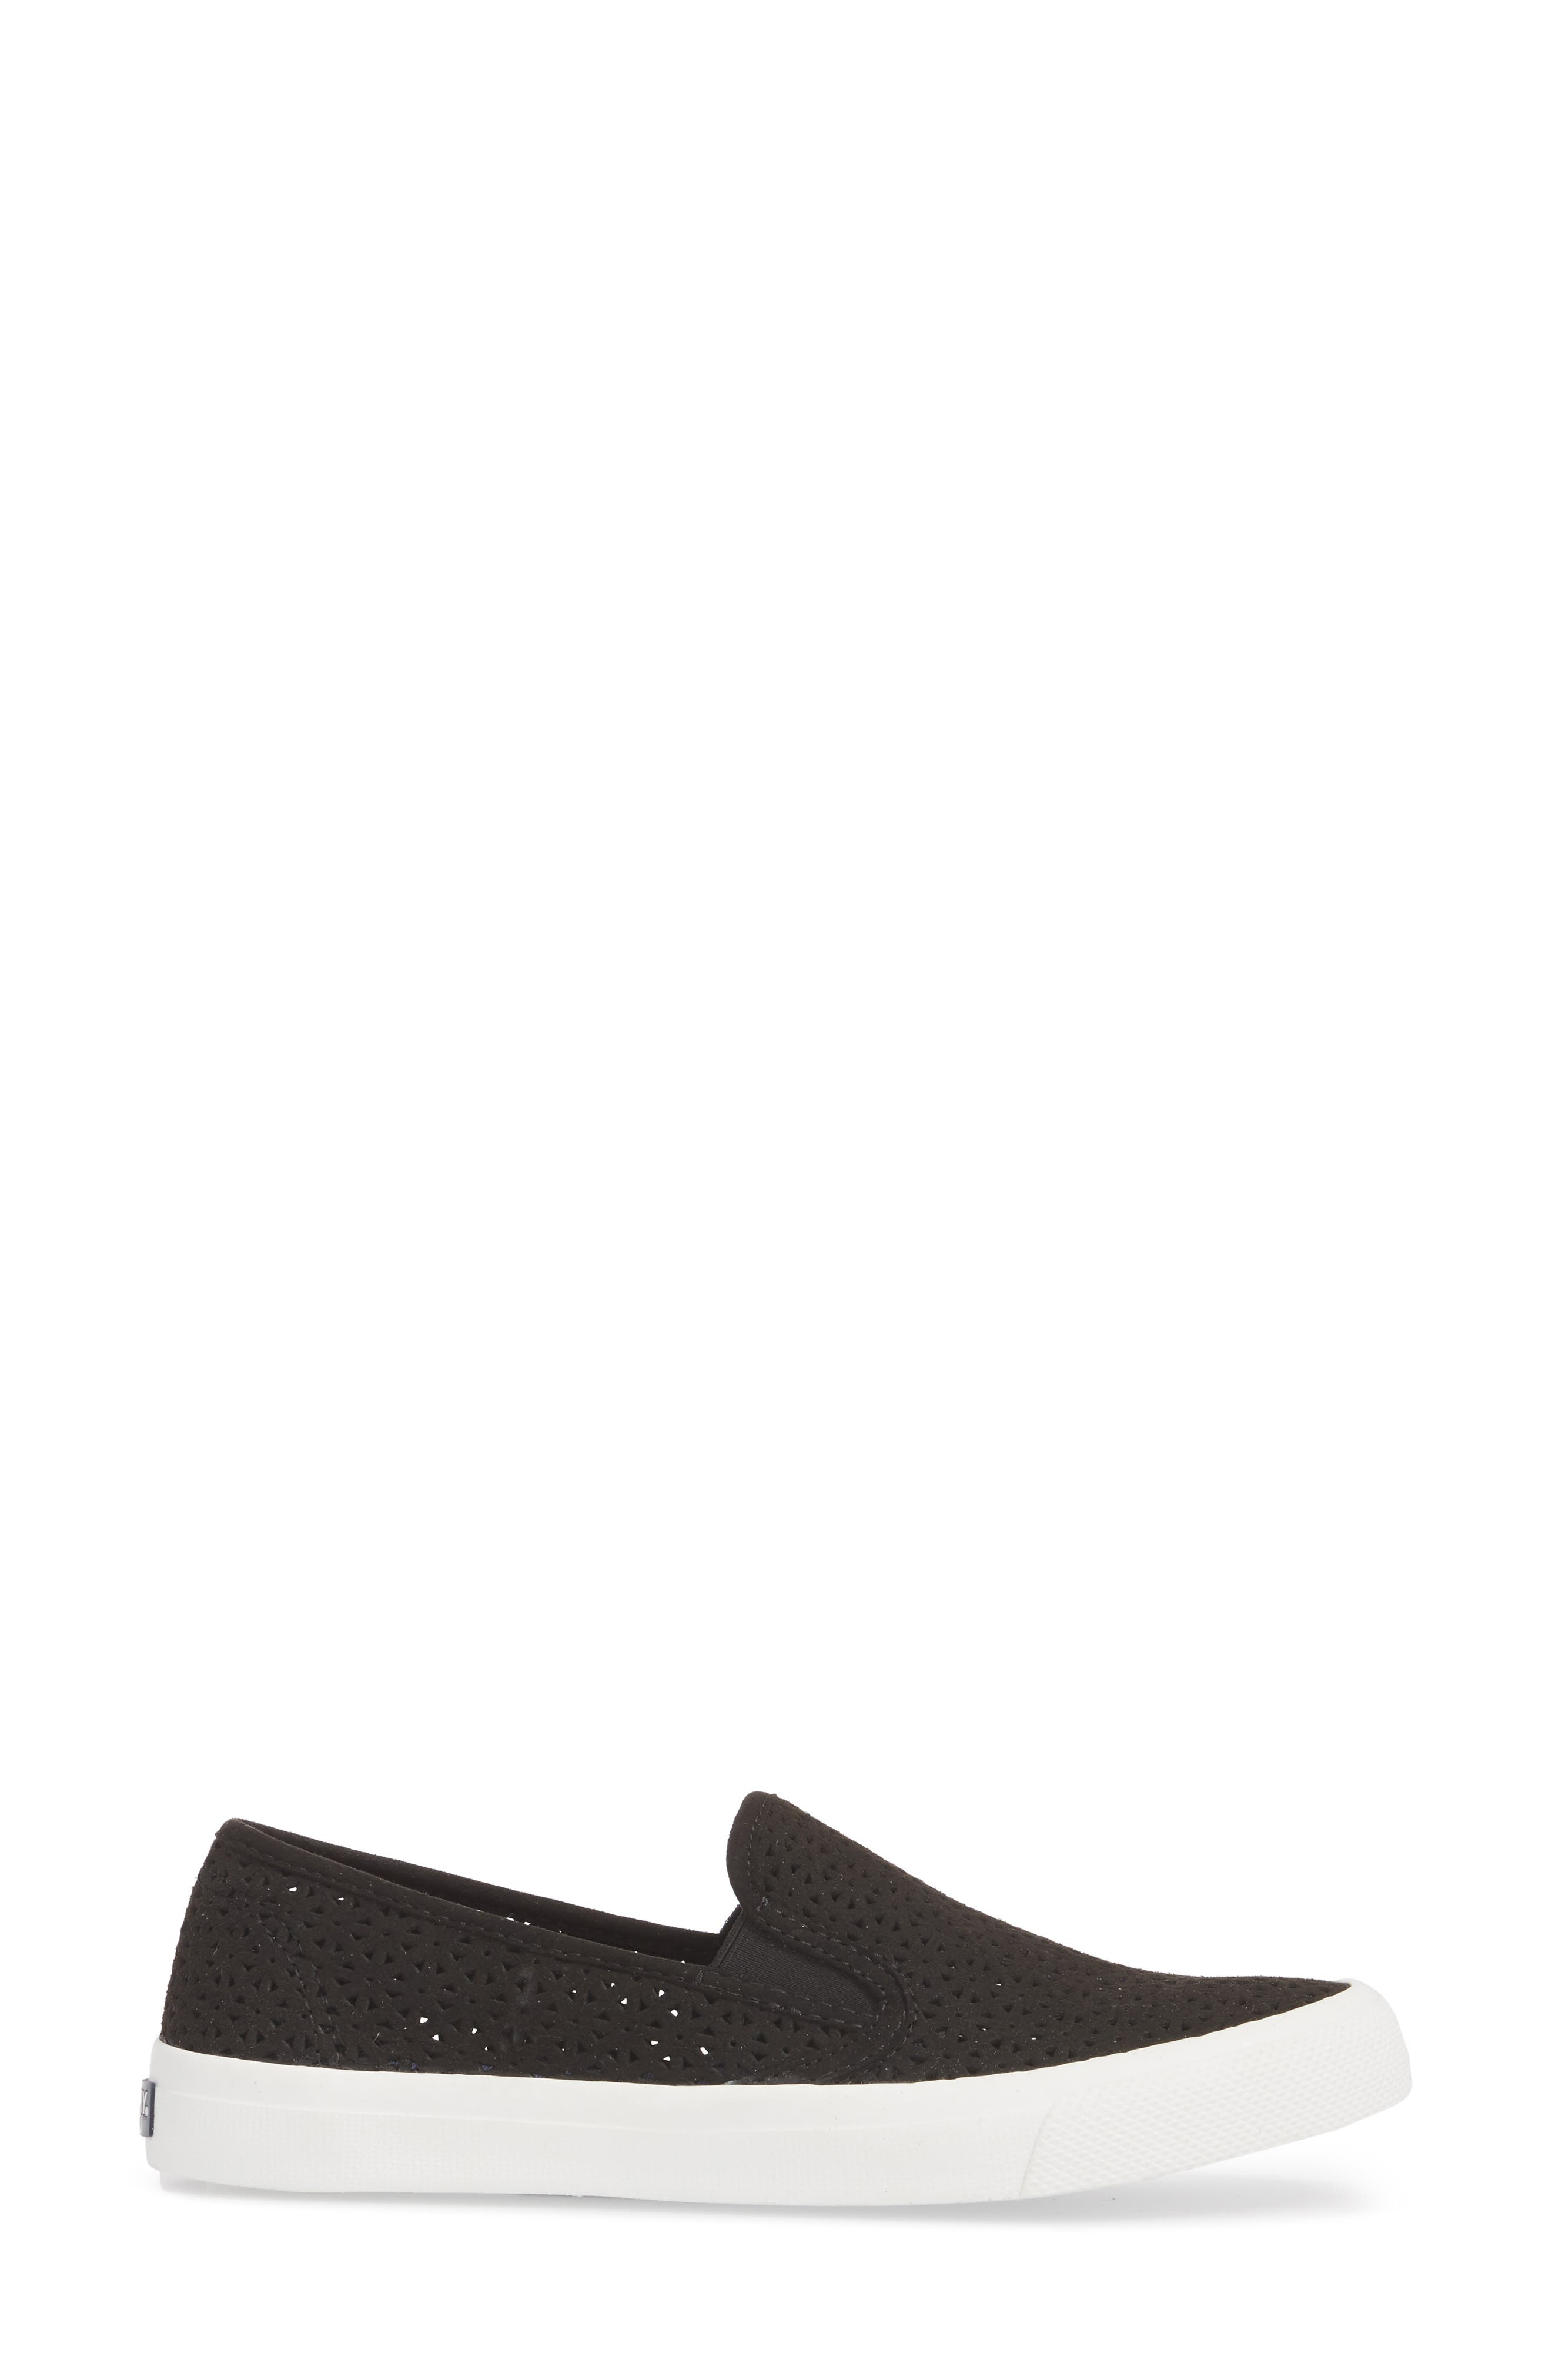 Seaside Nautical Perforated Slip-On Sneaker,                             Alternate thumbnail 3, color,                             BLACK LEATHER